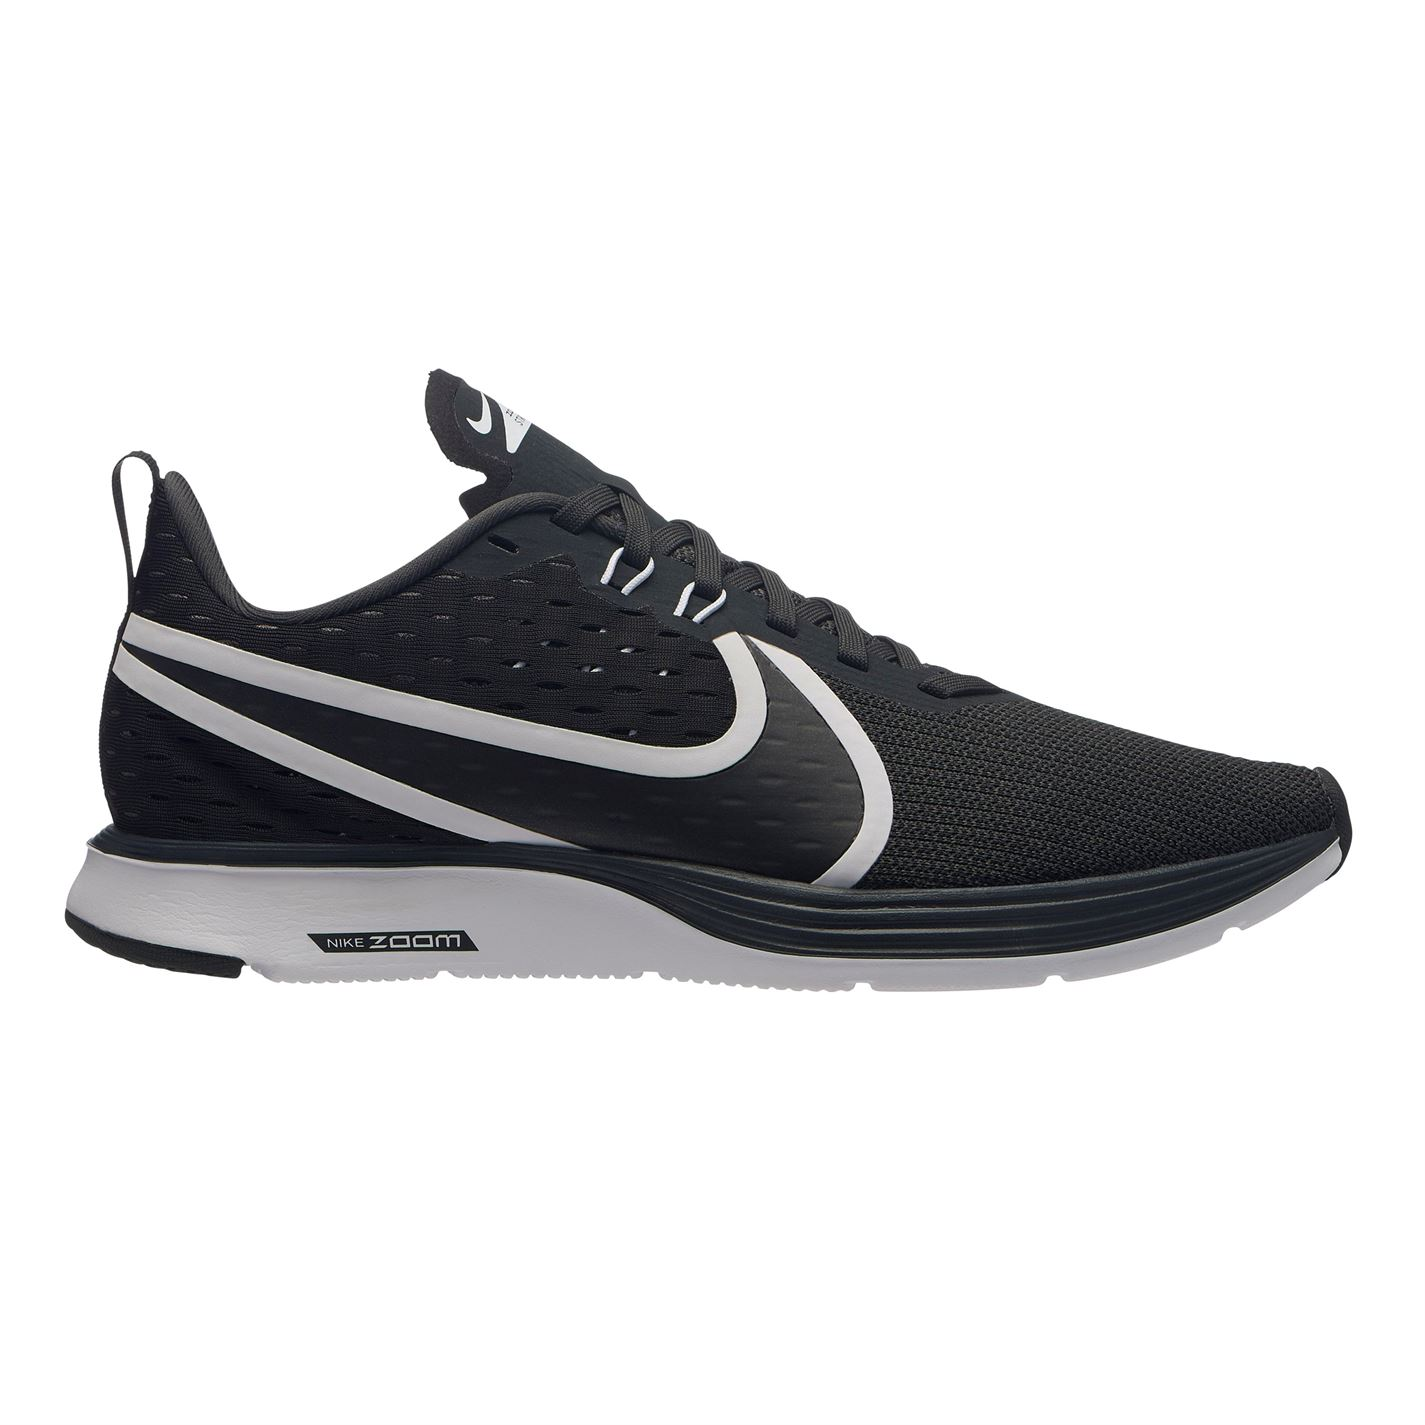 4b2627e59a7a boty Nike Zoom Strike 2 Ld93 Black White - Glami.sk